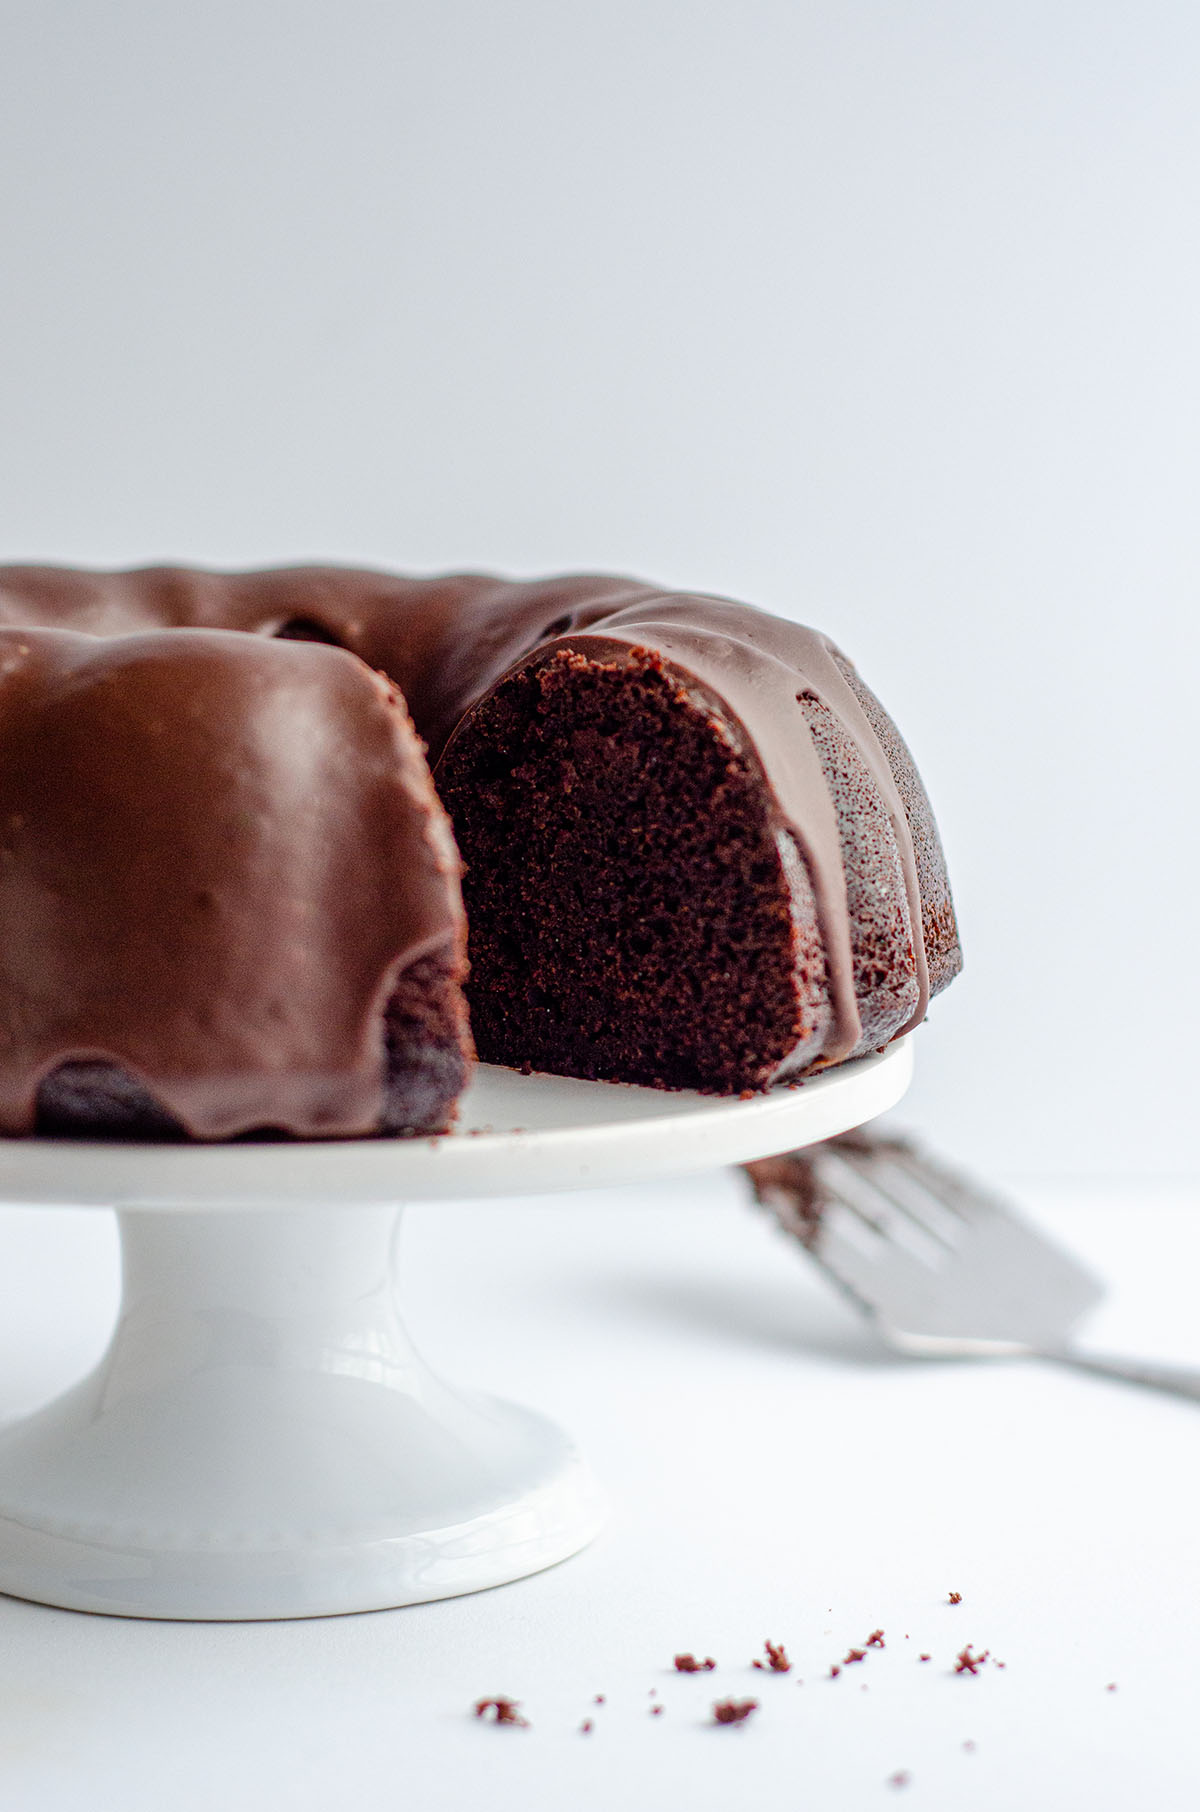 chocolate bundt cake on a cake stand